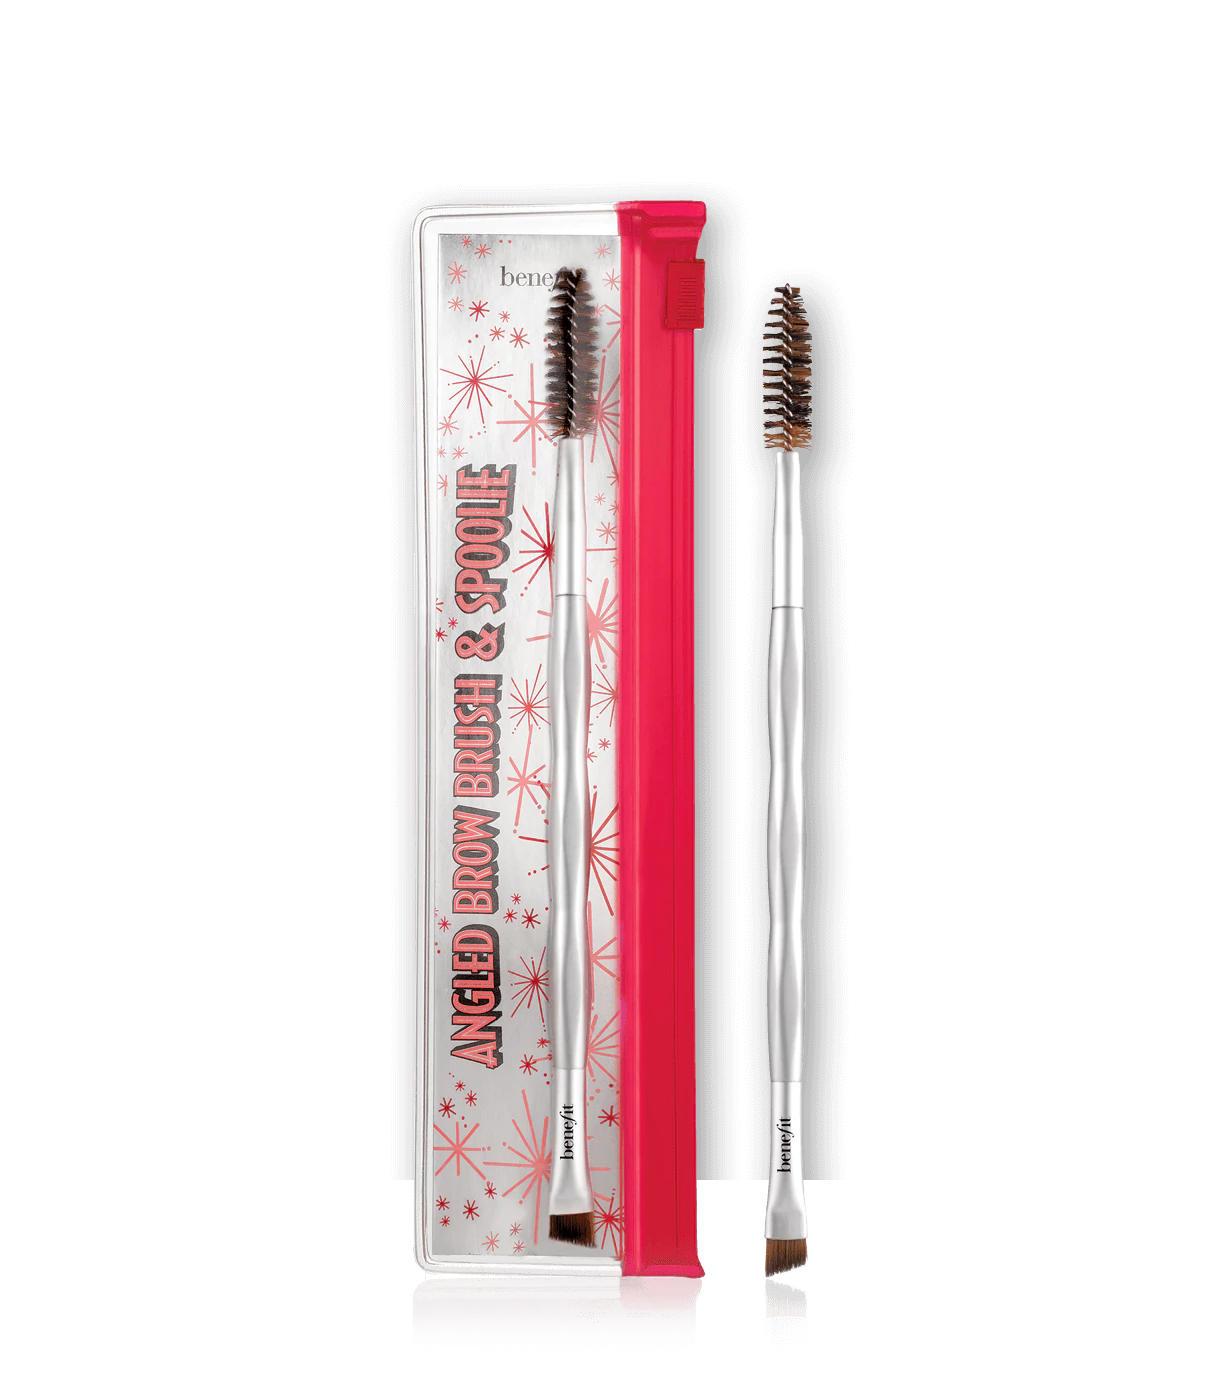 Benefit Angled Brow Brush & Spoolie